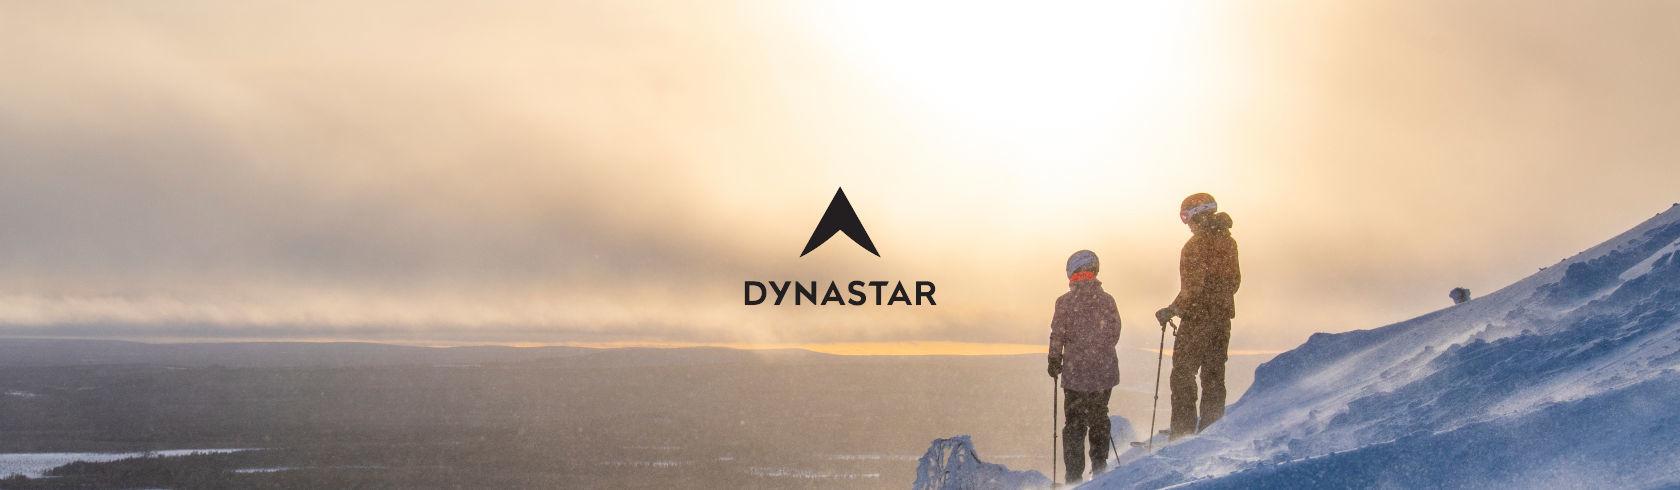 Dynastar brand logo